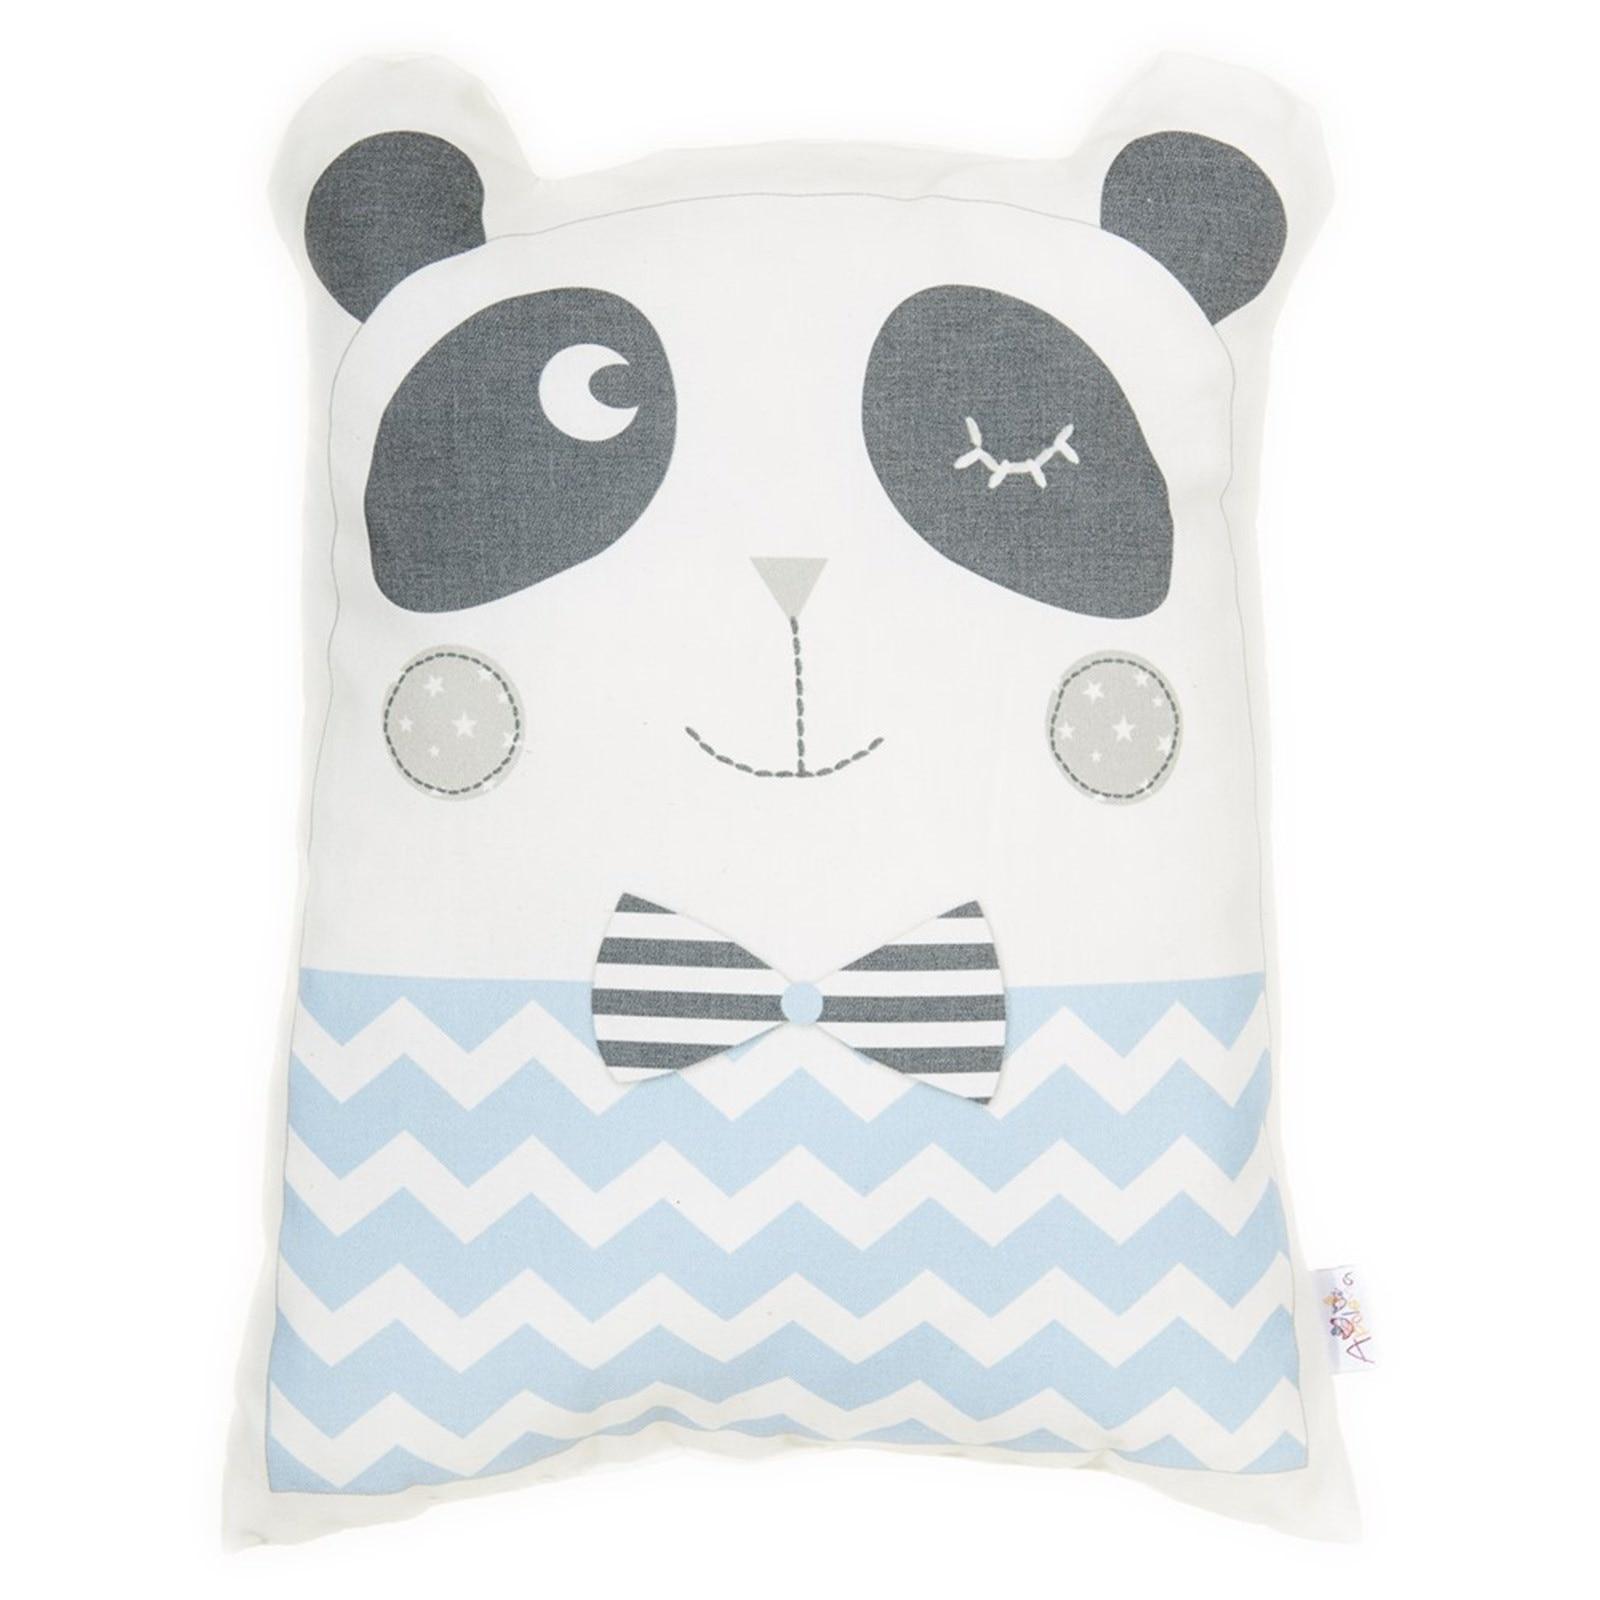 Ebebek Apolena Baby Crib Toy Pillow